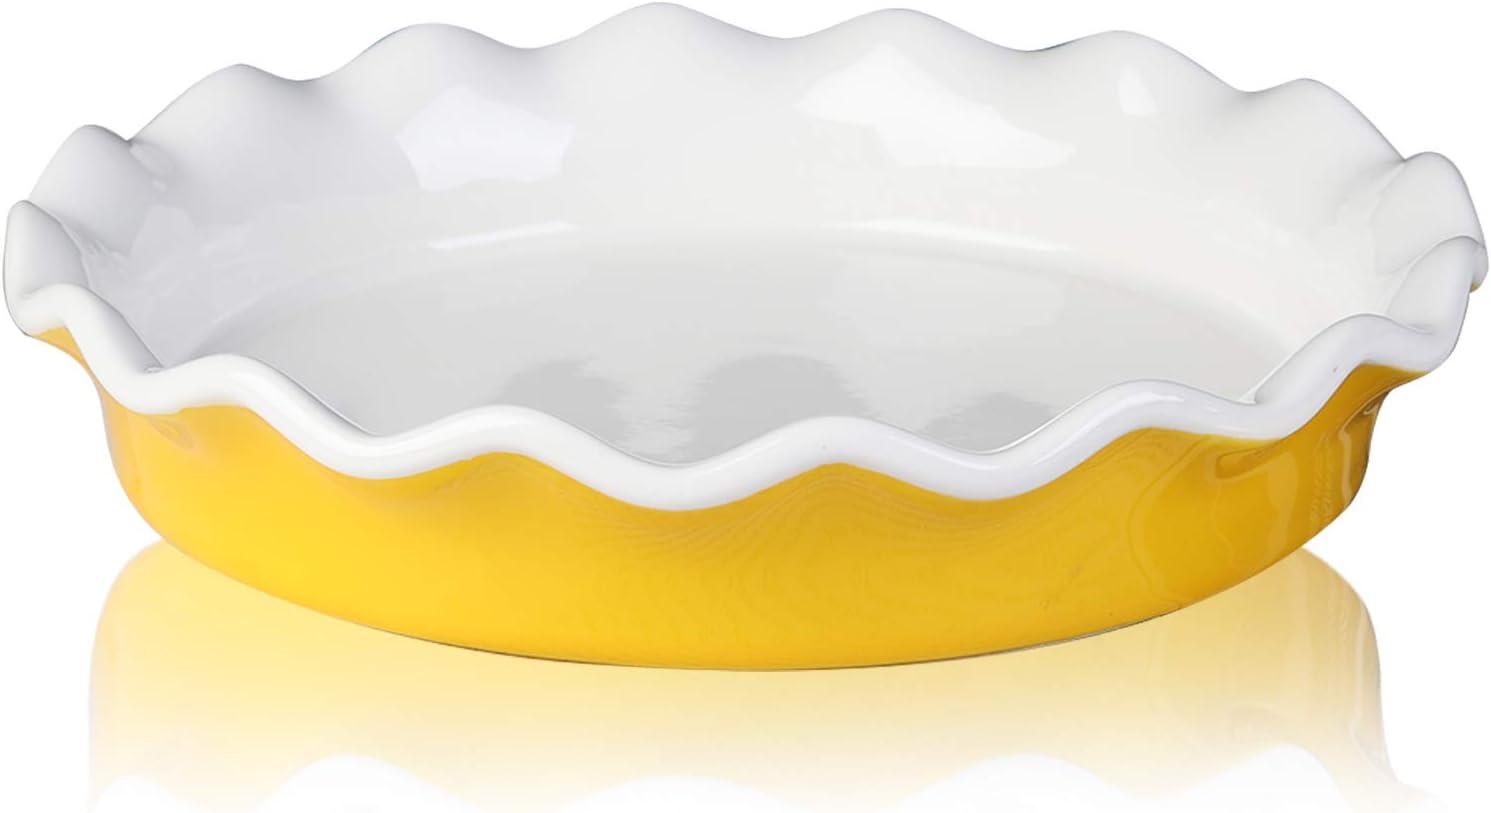 Ceramic Pie Pan, Jemirry 10 inch Pie Dish Pie Plates Round Baking Dish for Quiche Gratin Cake Pizza Dessert -Yellow